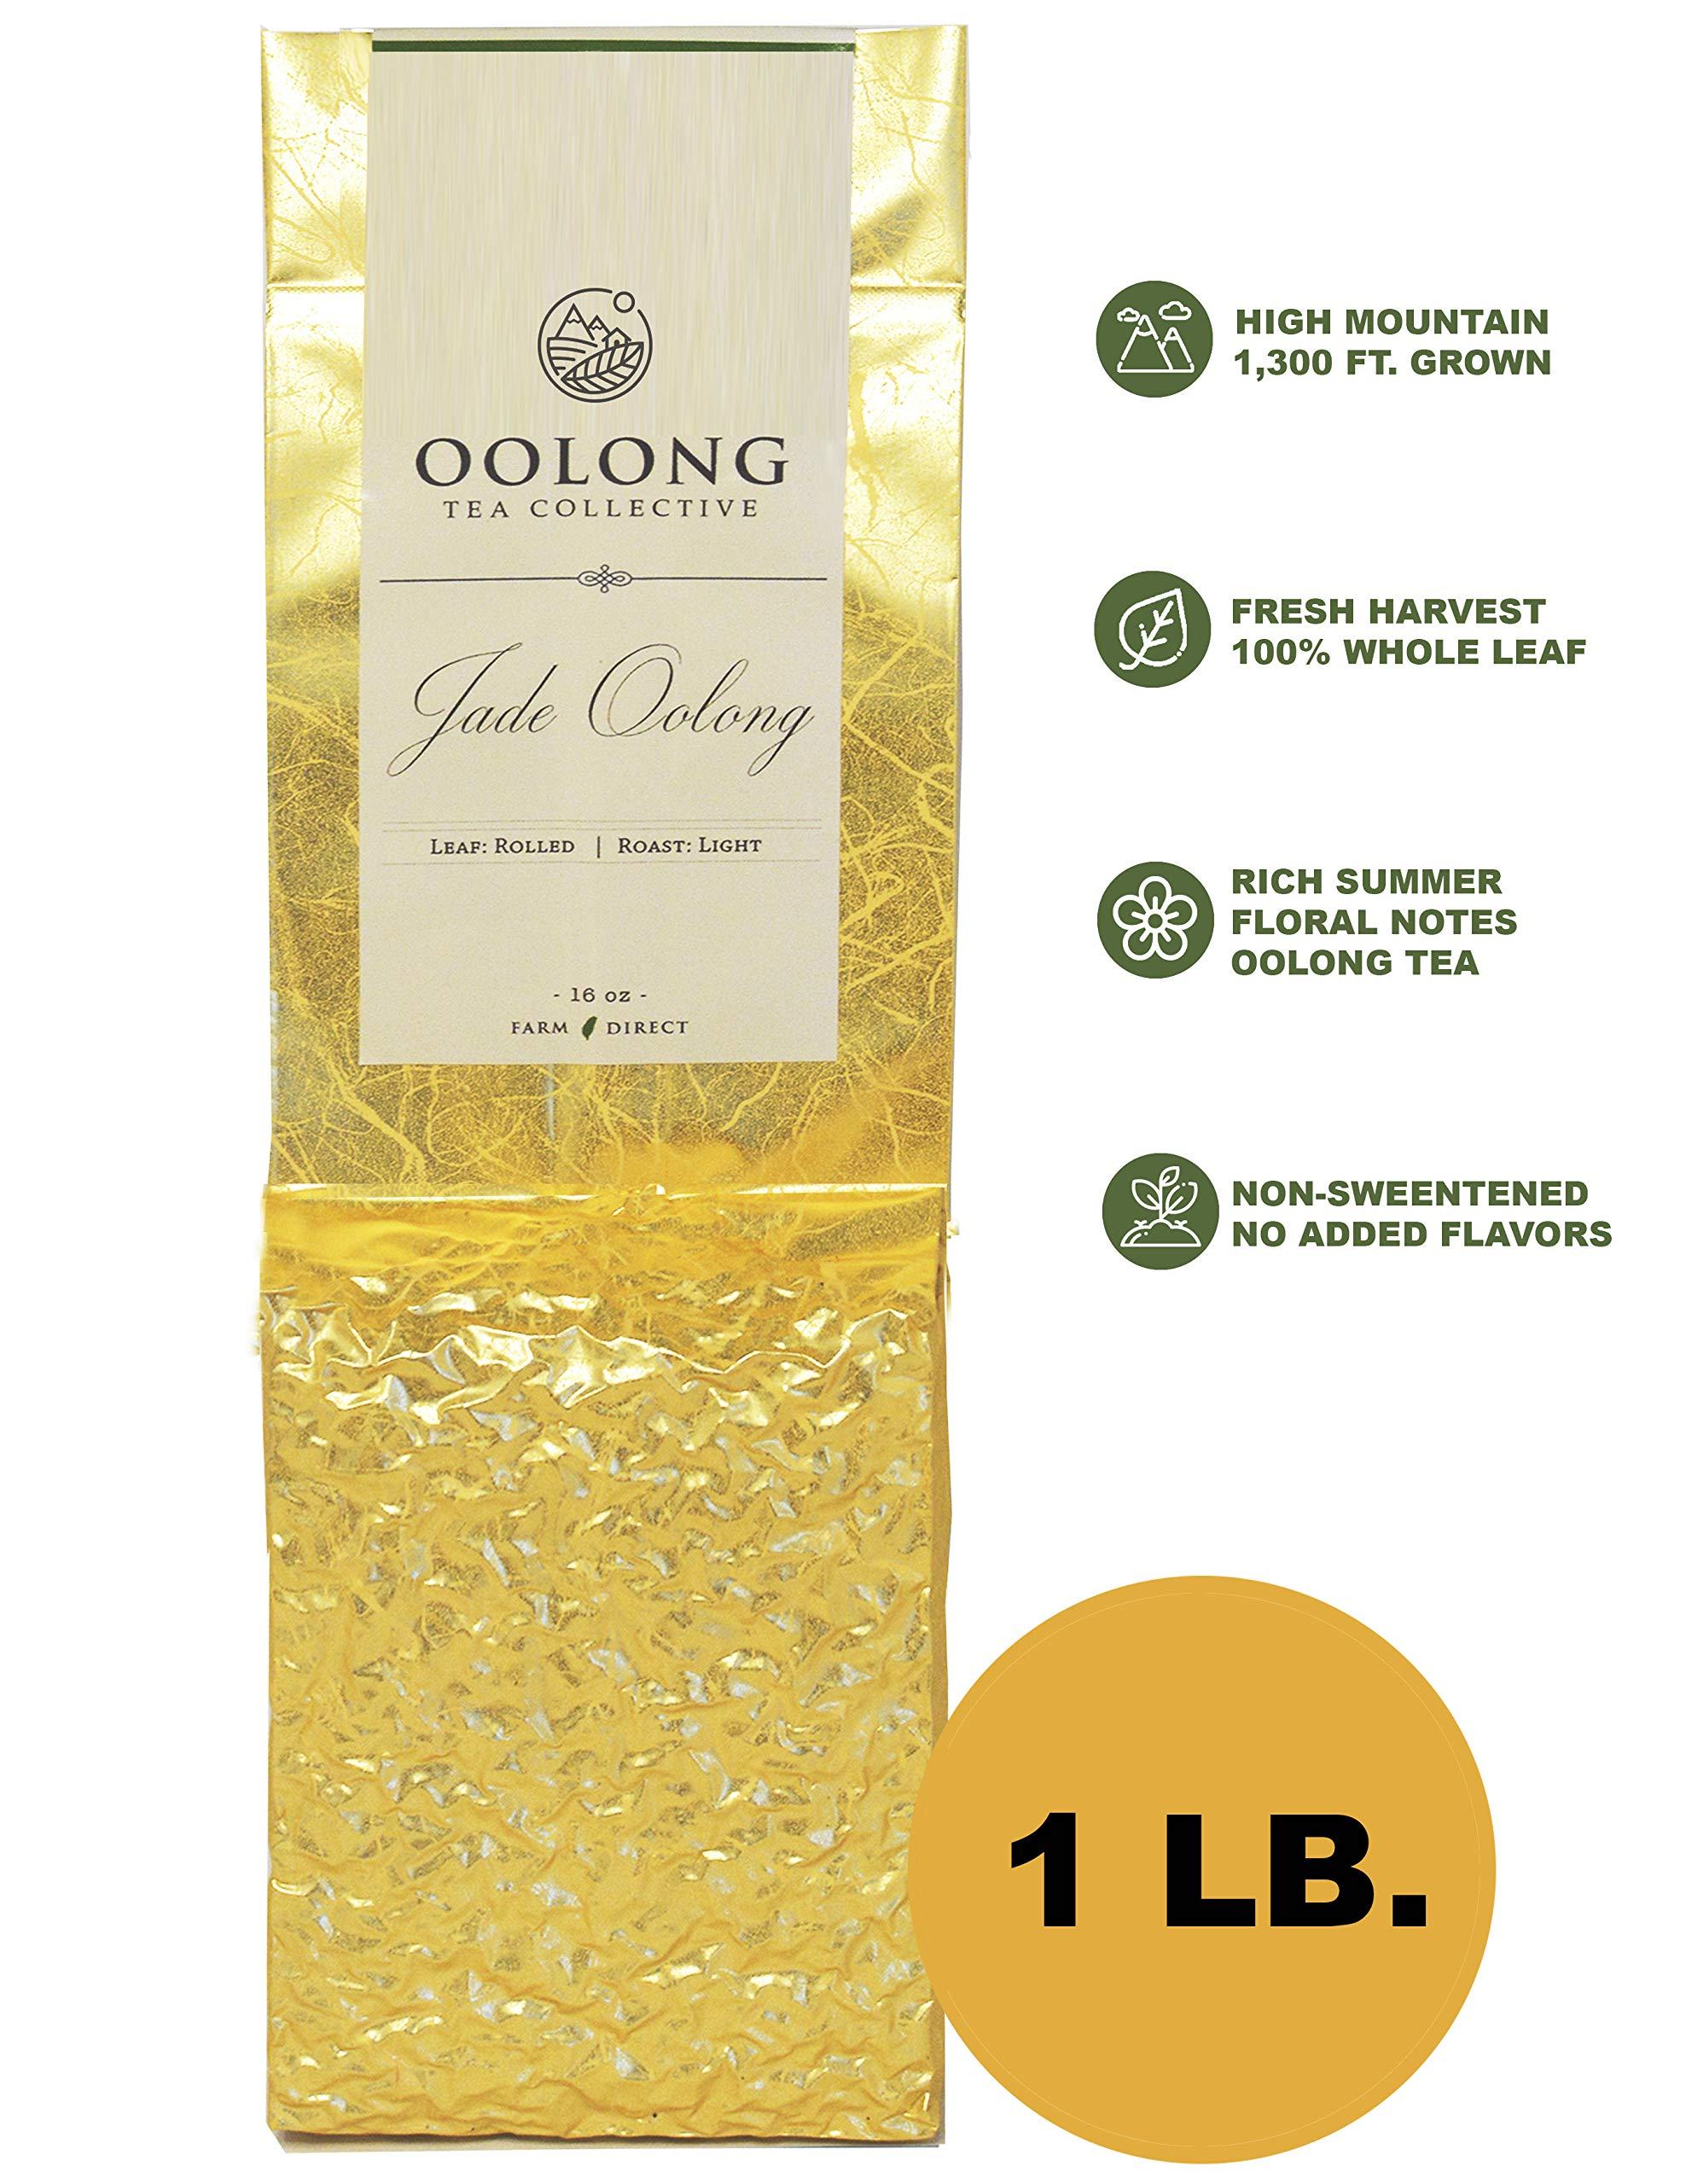 Jade Oolong Tea - 2019 Fresh Harvest - Natural Loose Leaf Tea - No Additives - 100% Taiwan Farm Direct by Oolong Tea Collective (16oz) by Oolong Tea Collective